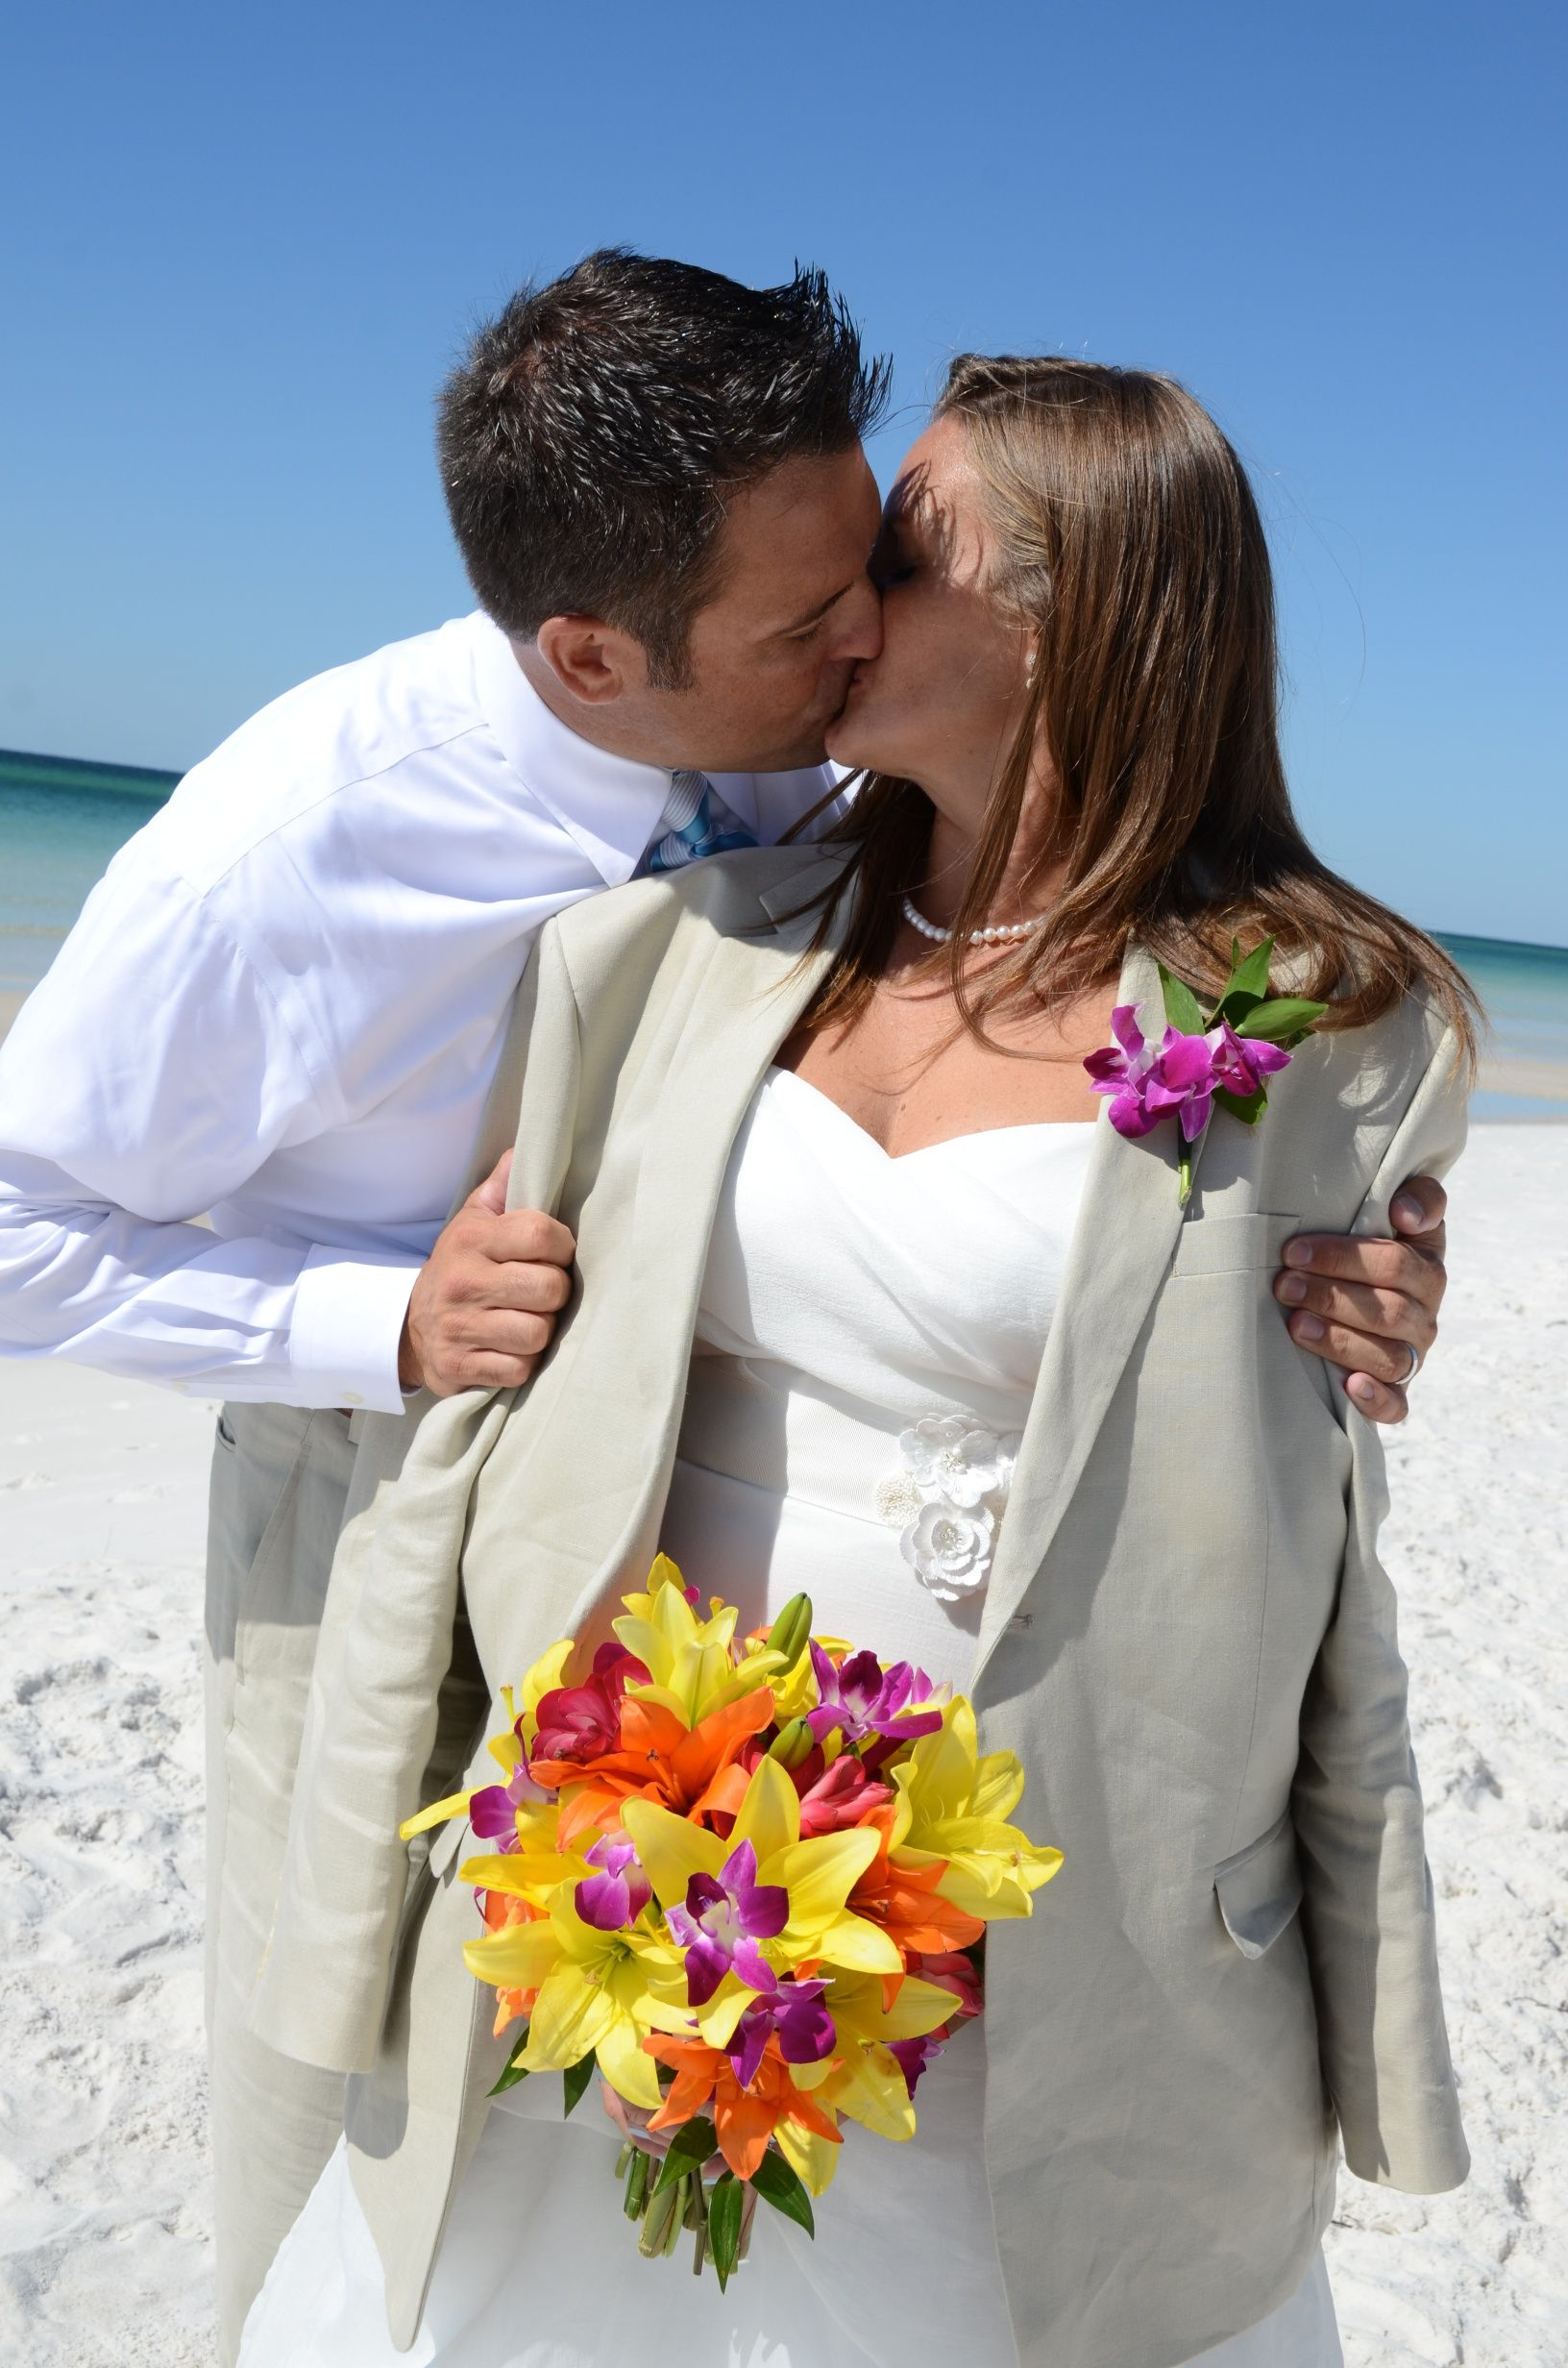 all inclusive beach wedding destinations%0A Beach wedding packages for Destin  u     Panama City Beach Florida   Photographer  wedding planner  all inclusive Destin weddings on the beach